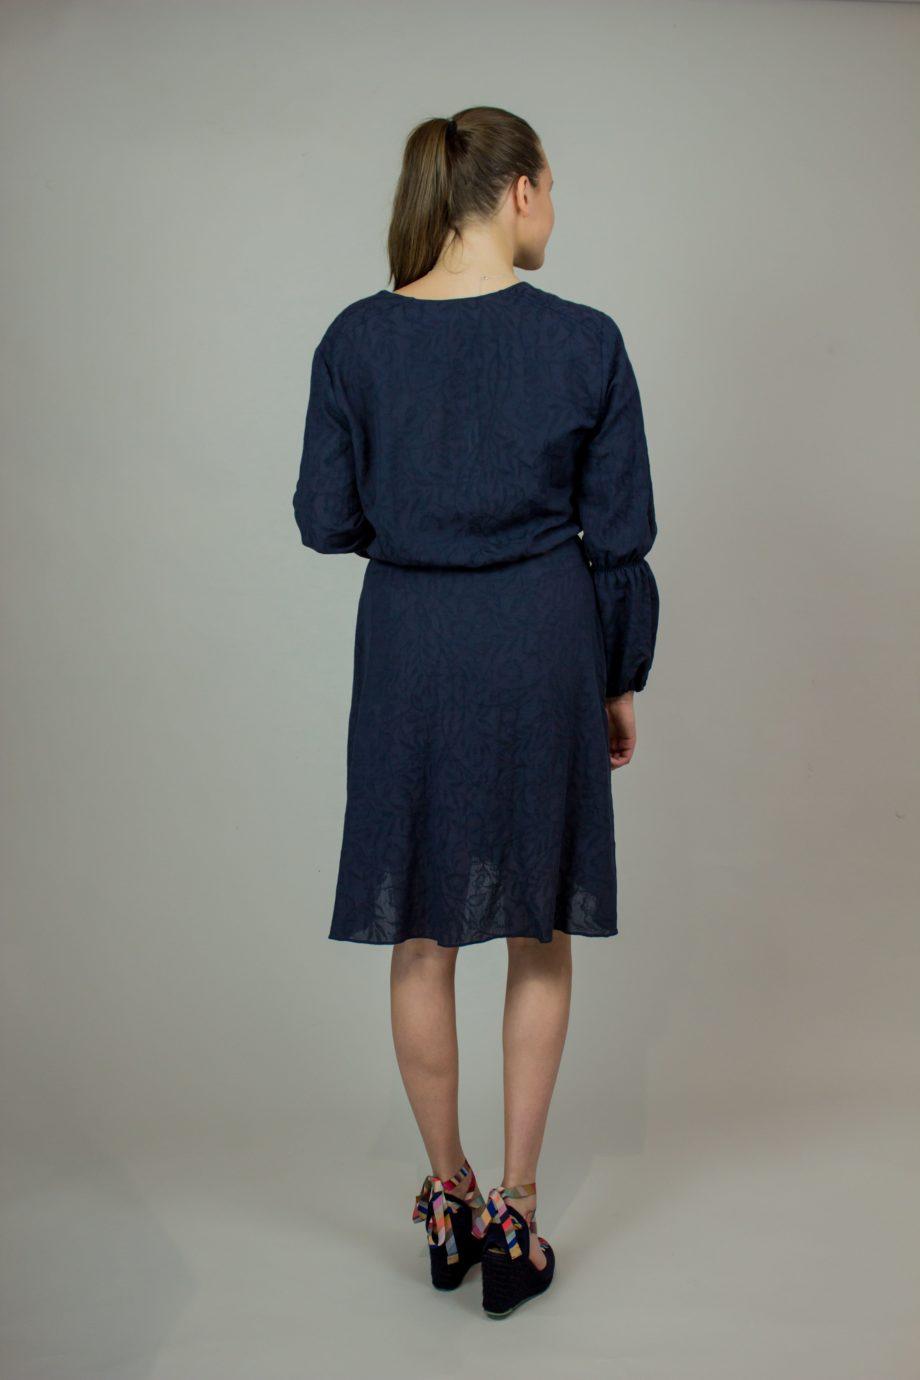 12. KRISTINA TI Dark blue dress